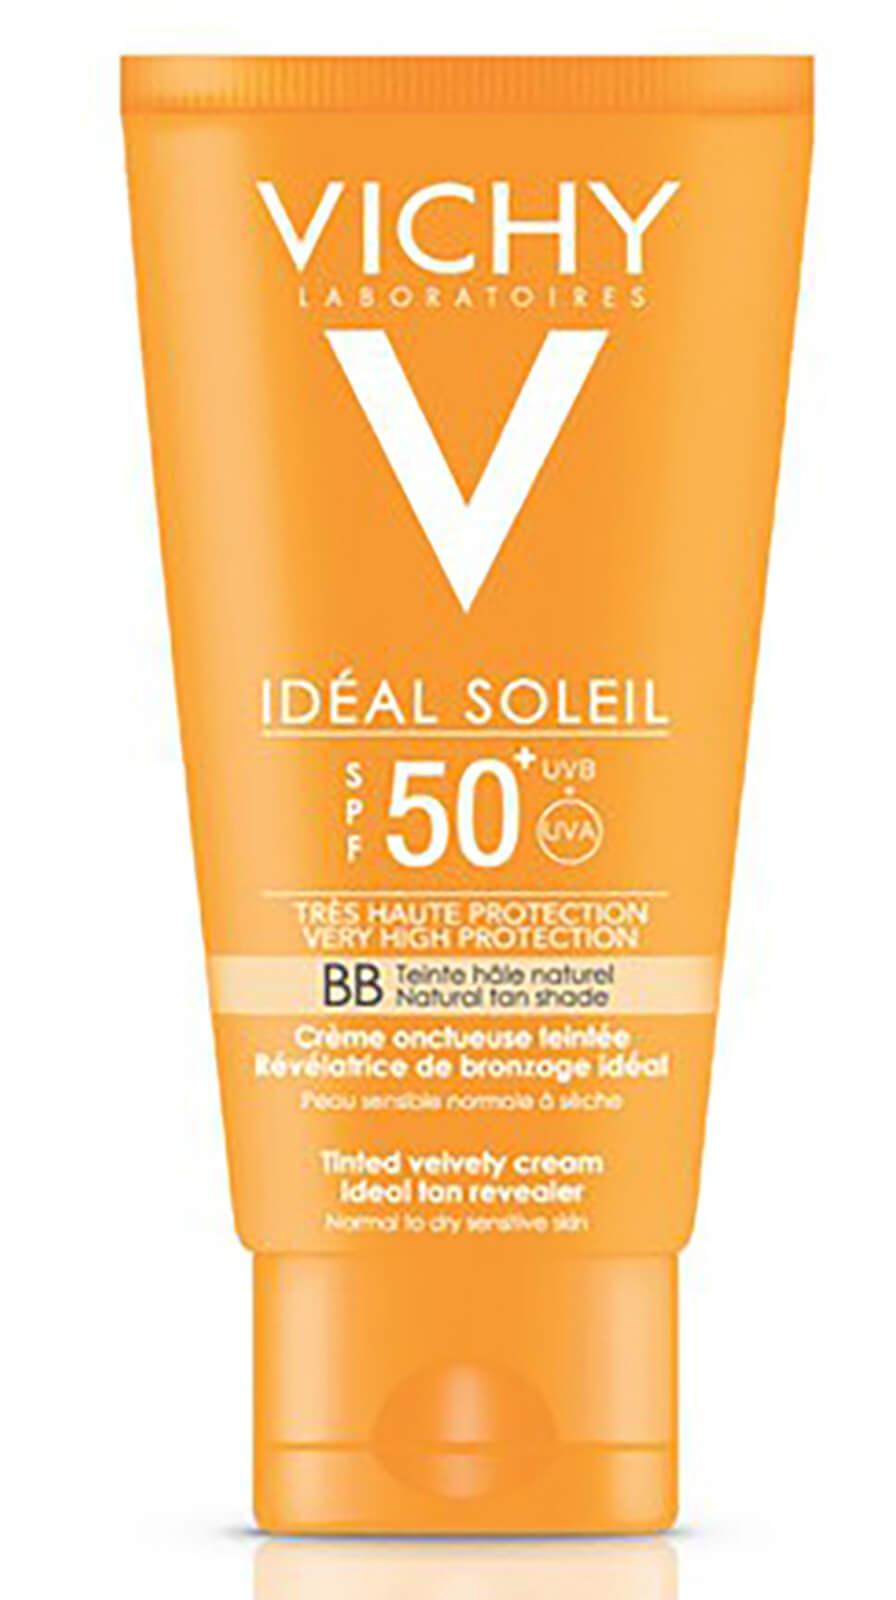 Vichy Idéal Soleil BB Tinted Velvety Cream SPF 50